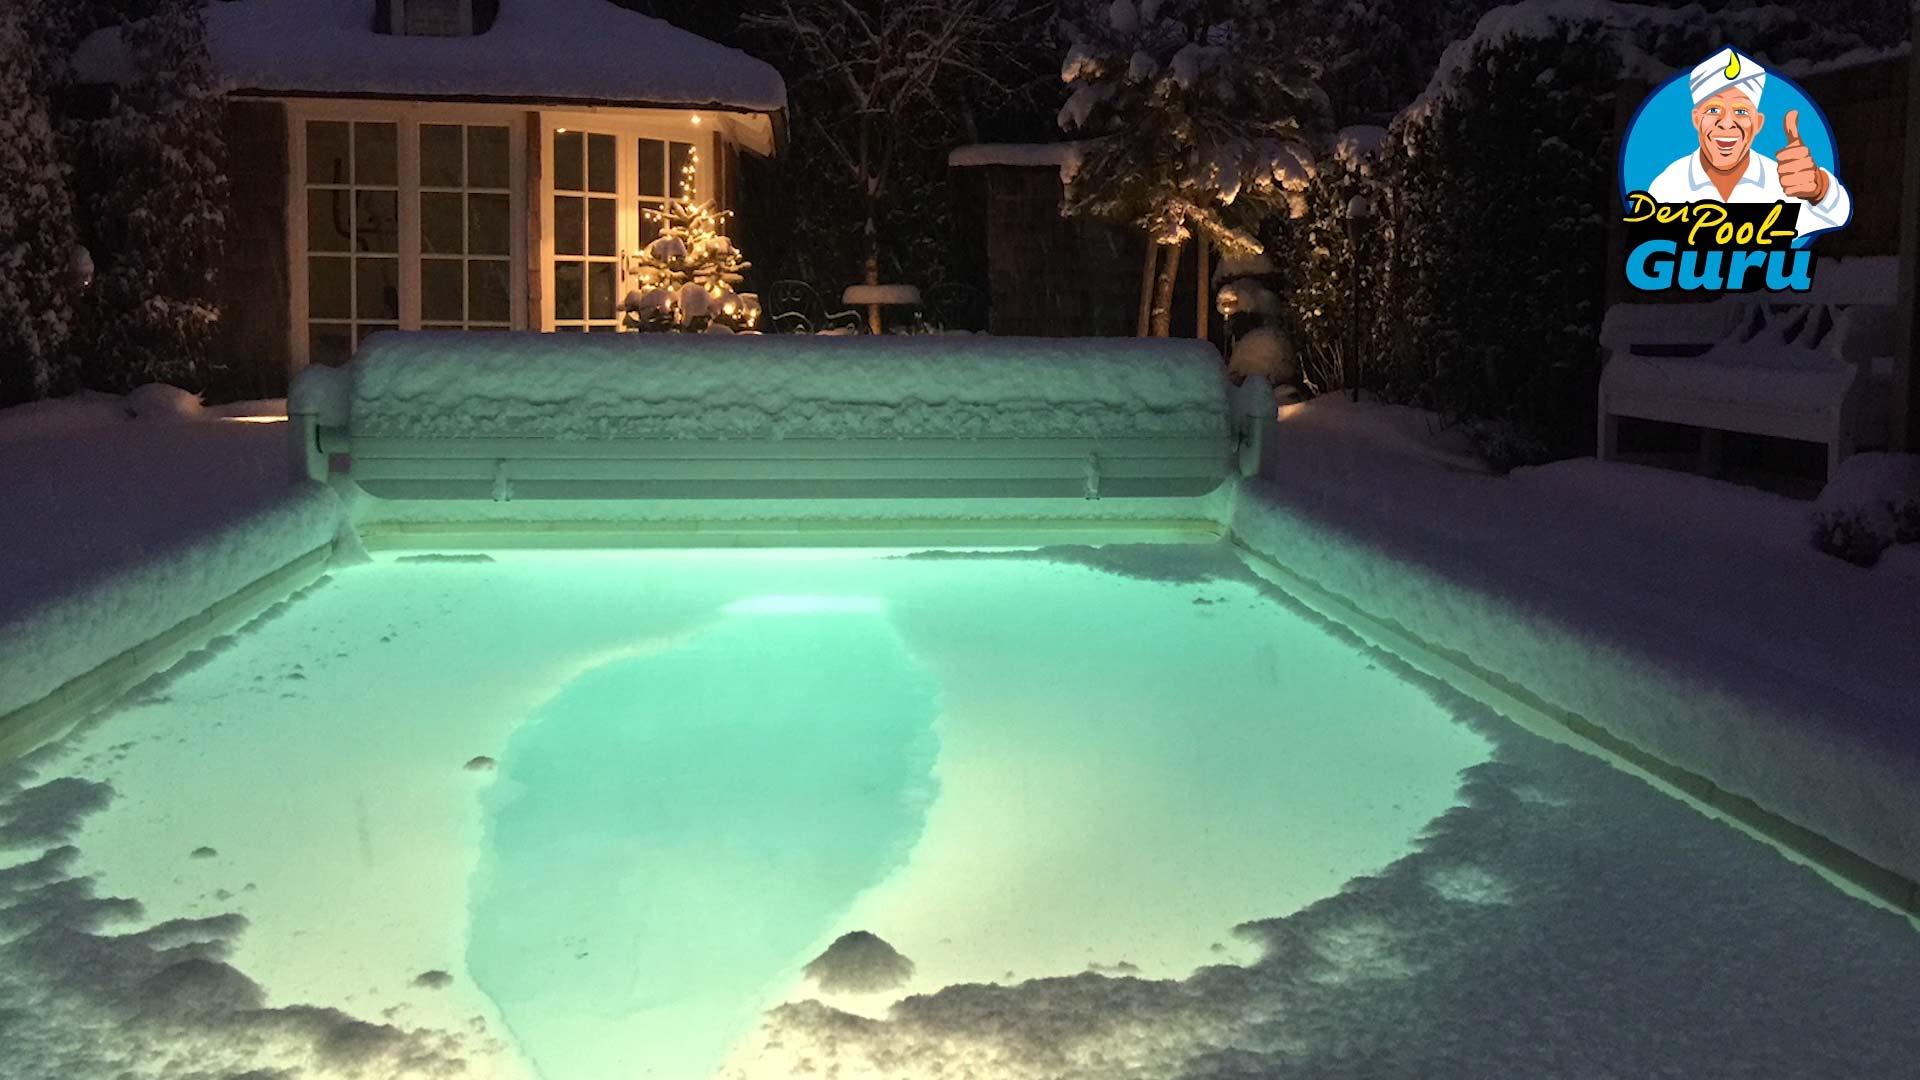 aktiver Swimmingpool im Winter